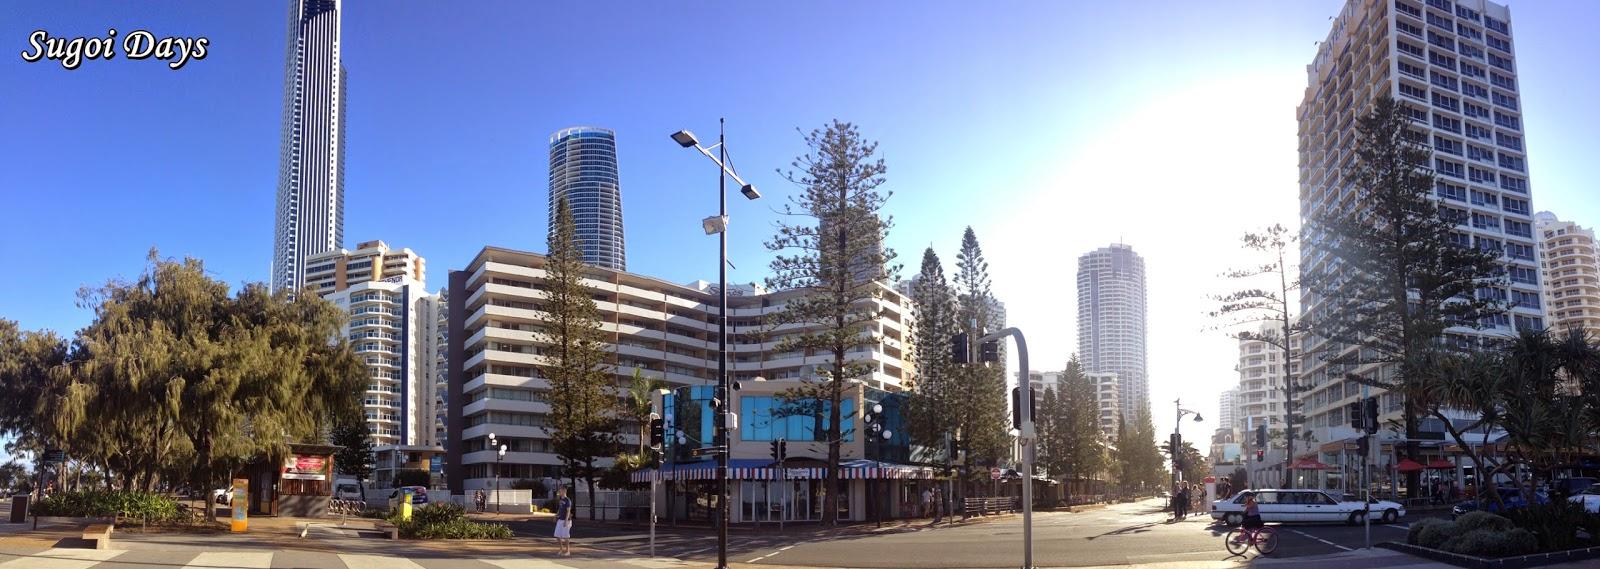 Gold Coast 2014 6d5n Itinerary